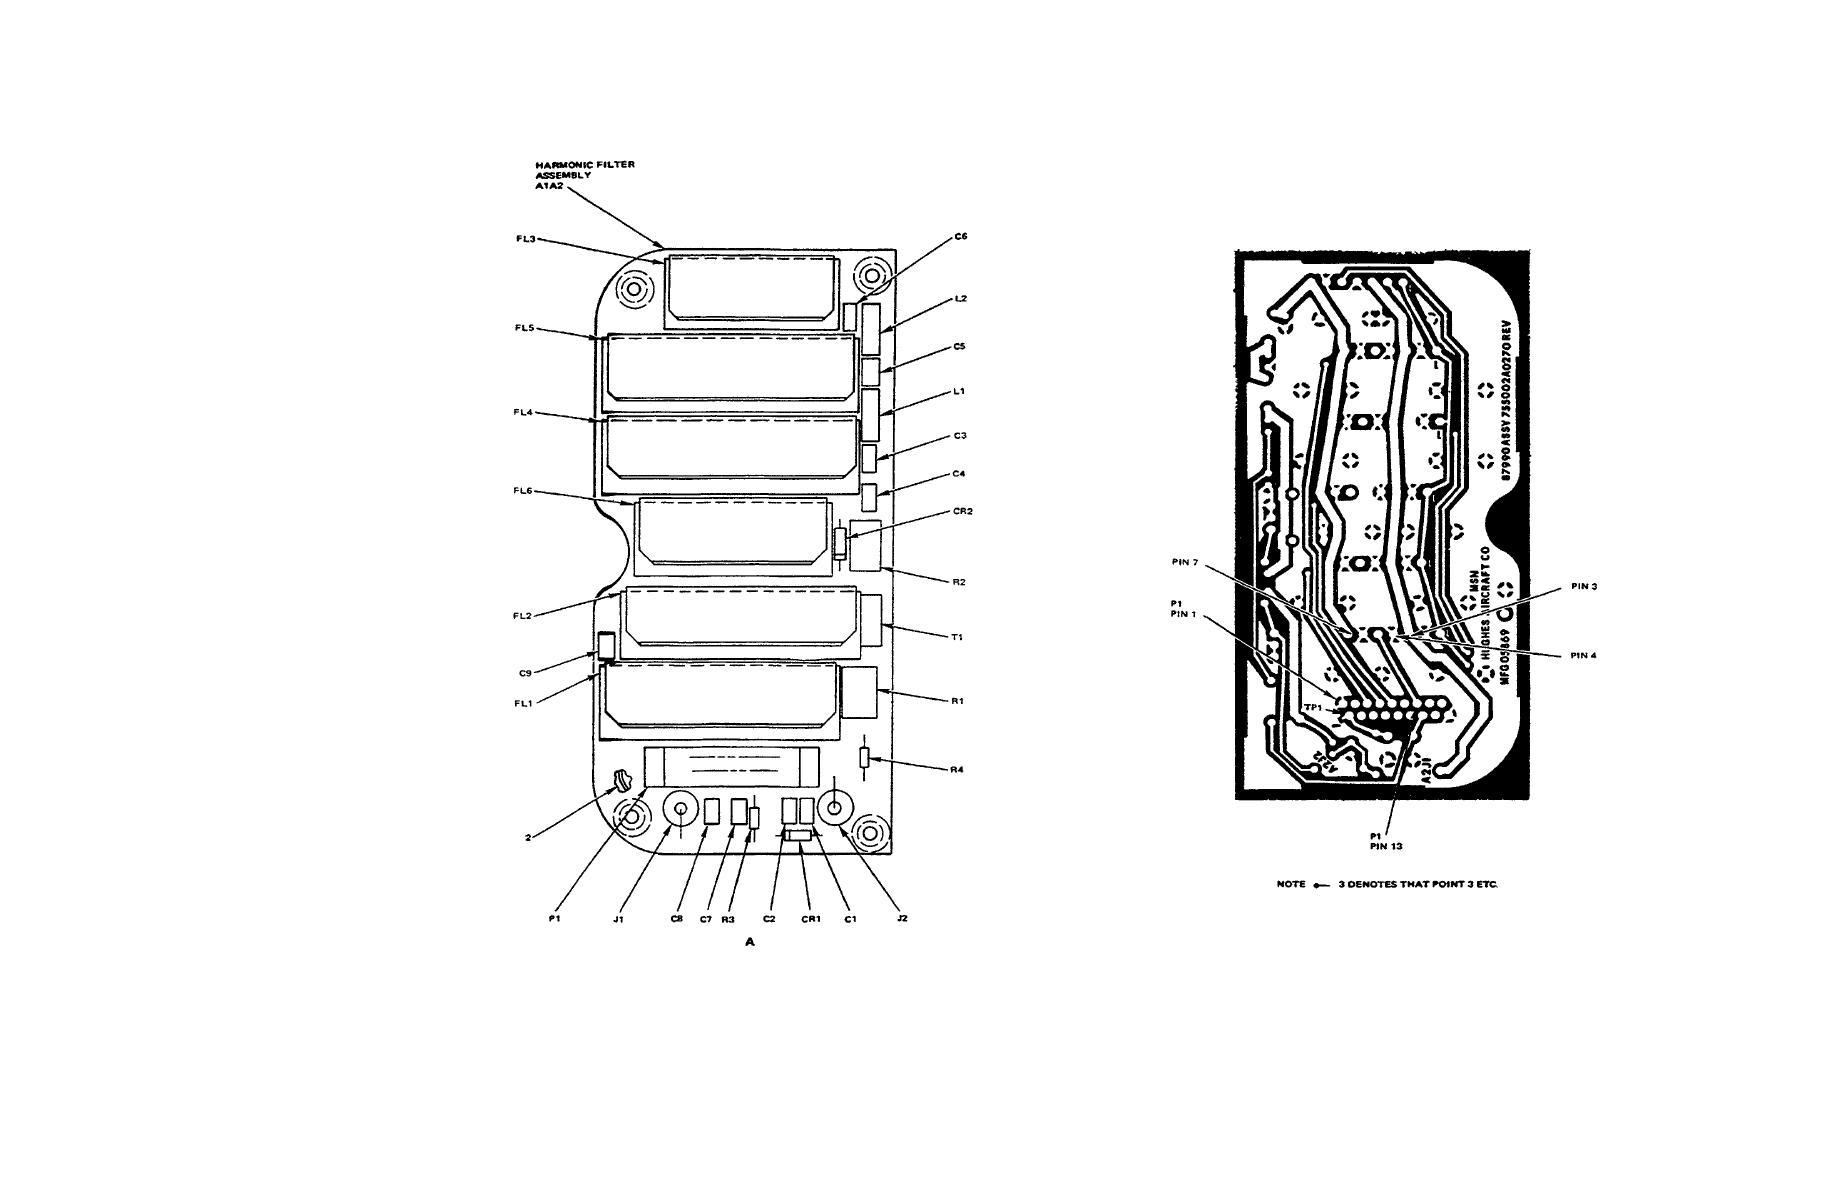 Figure 4 2 Harmonic Filter A1a2 Component Location